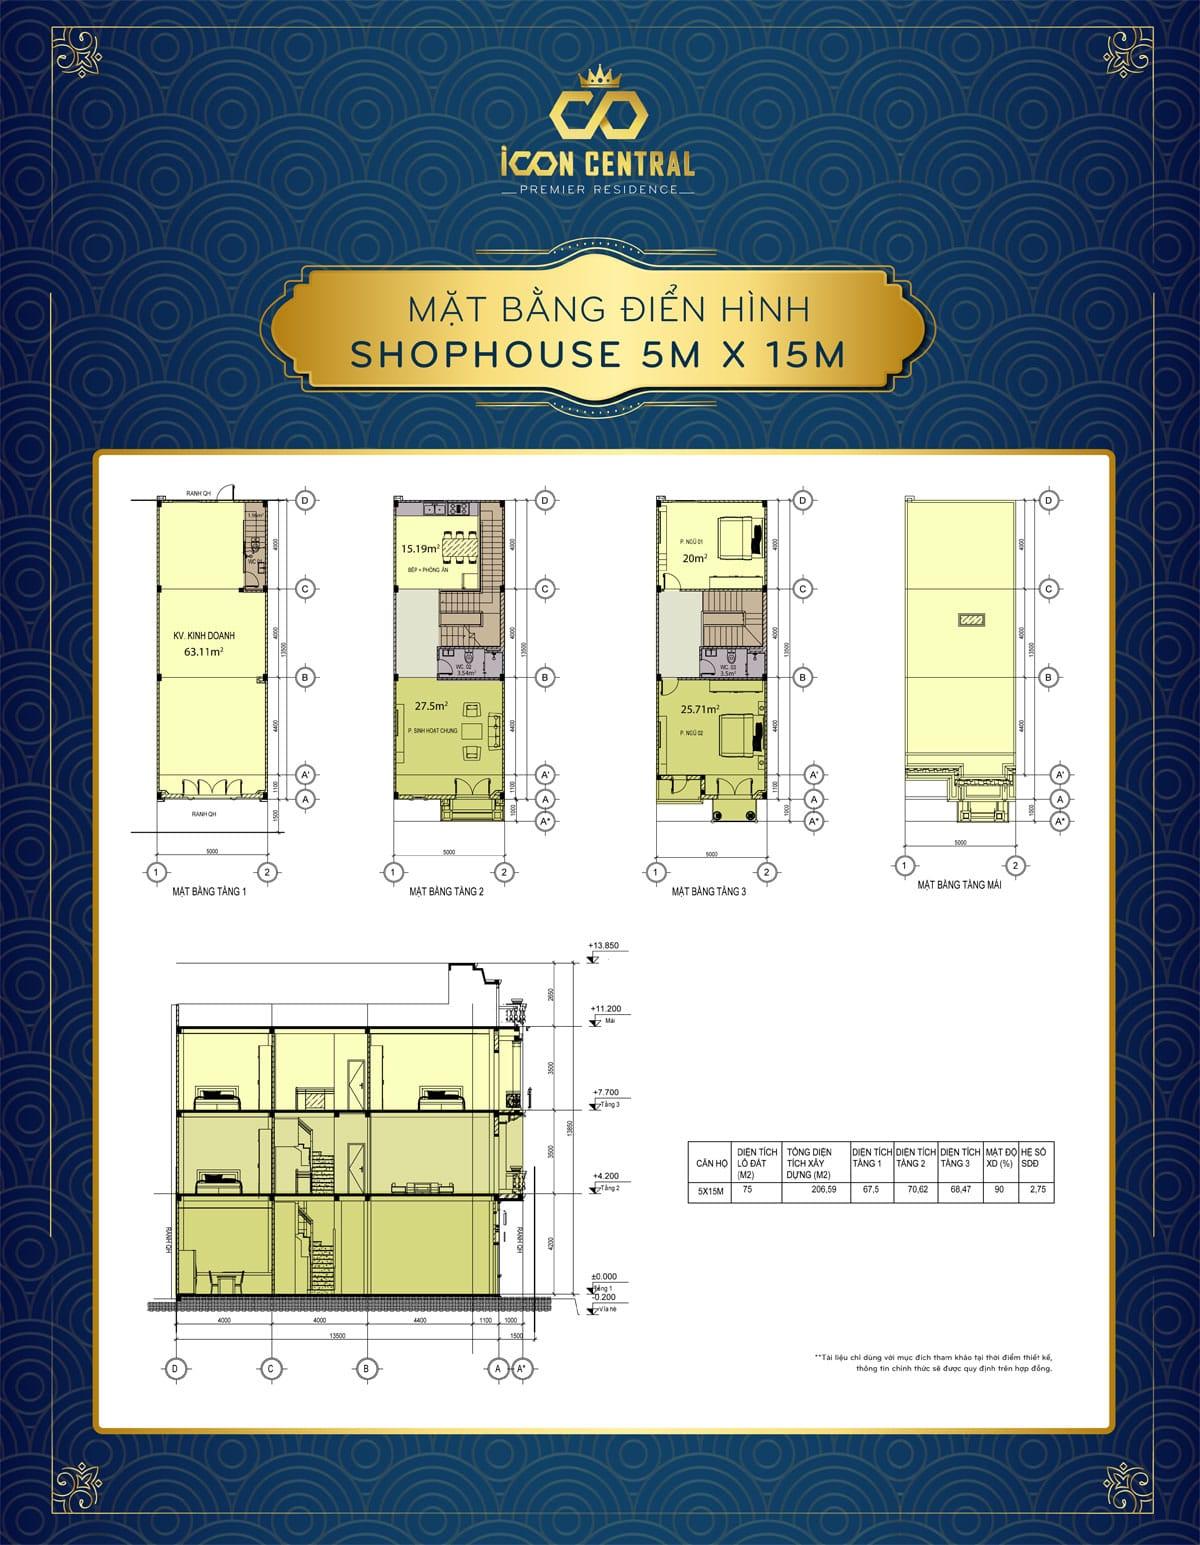 Mat bang dien hinh shophouse 5 x 15m icon central - shop office icon central dĩ an bình dương